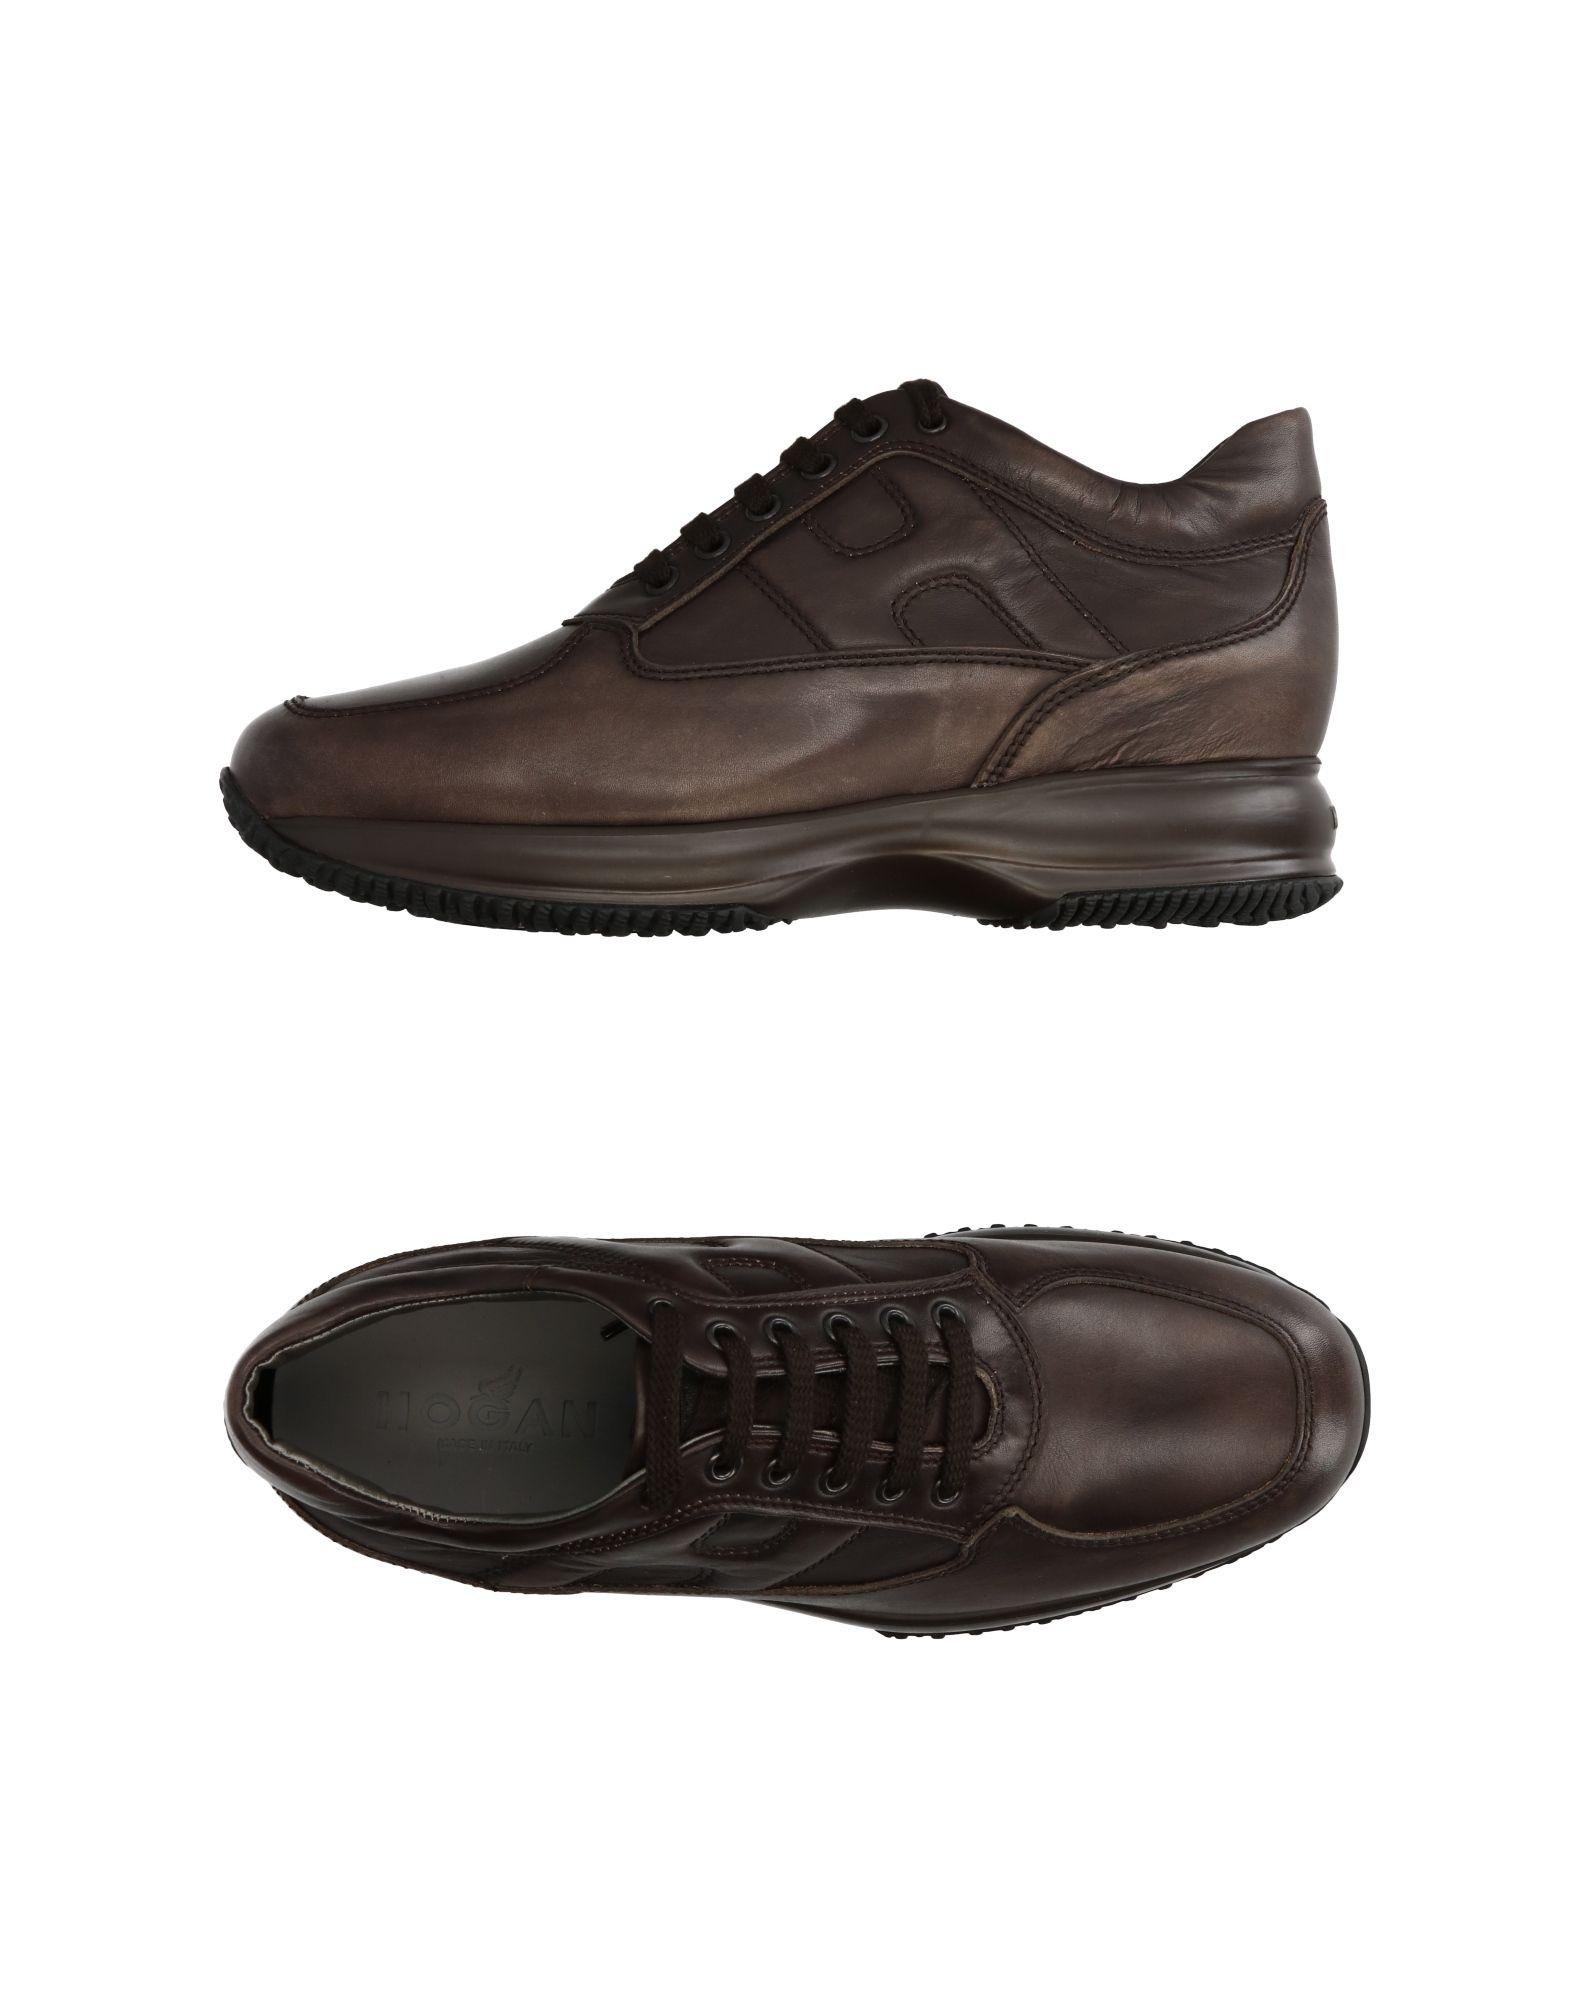 A buon mercato Sneakers Hogan Uomo - 11297998II